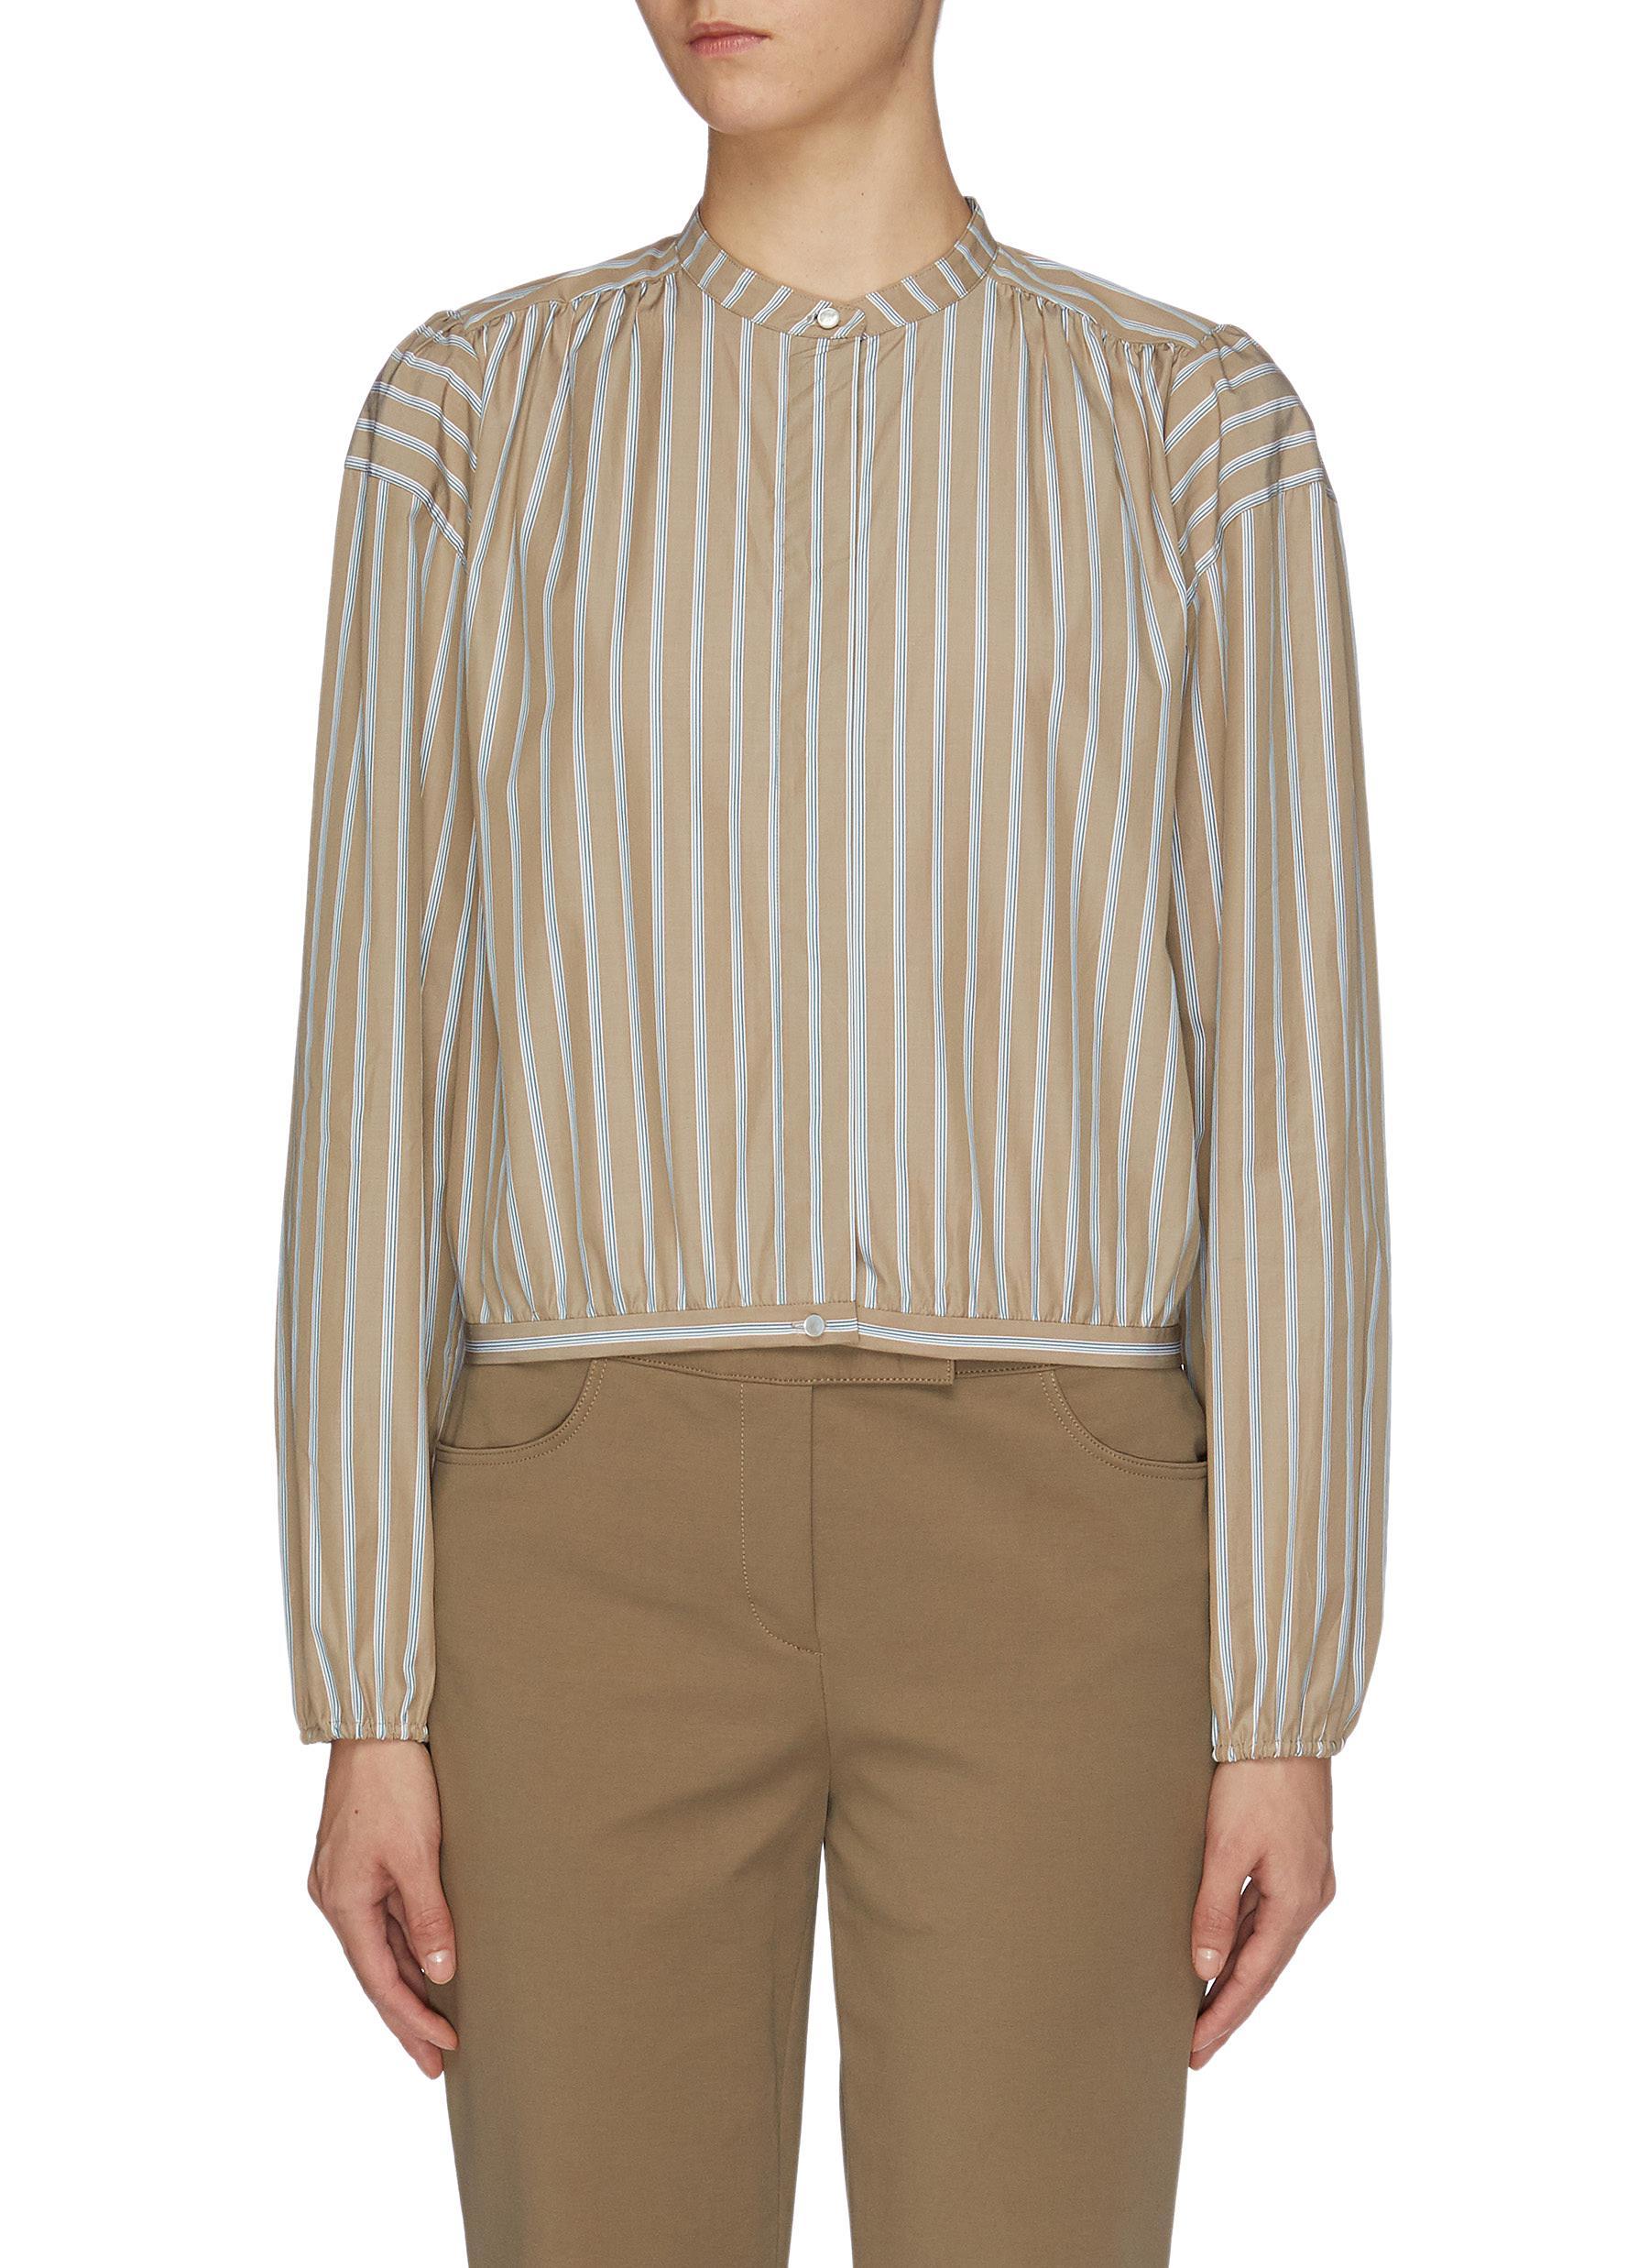 Ribbon tie waist shirred yoke stripe shirt by Theory